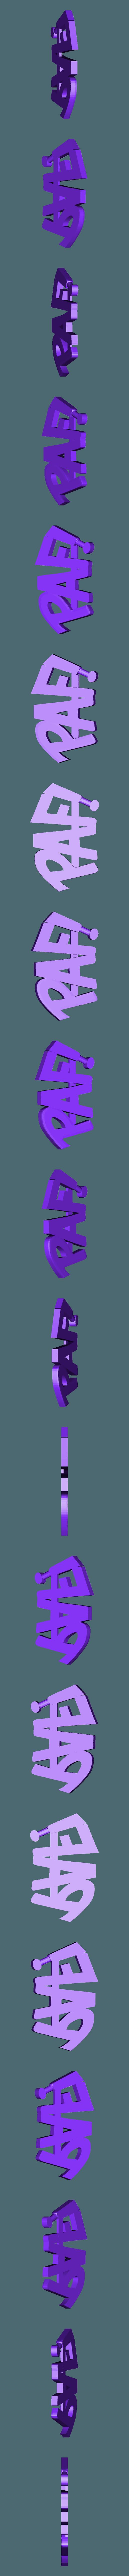 paf.stl Descargar archivo STL FANART - Obélix abofetea a un legionario romano - Diorama • Objeto para impresora 3D, foxgraph